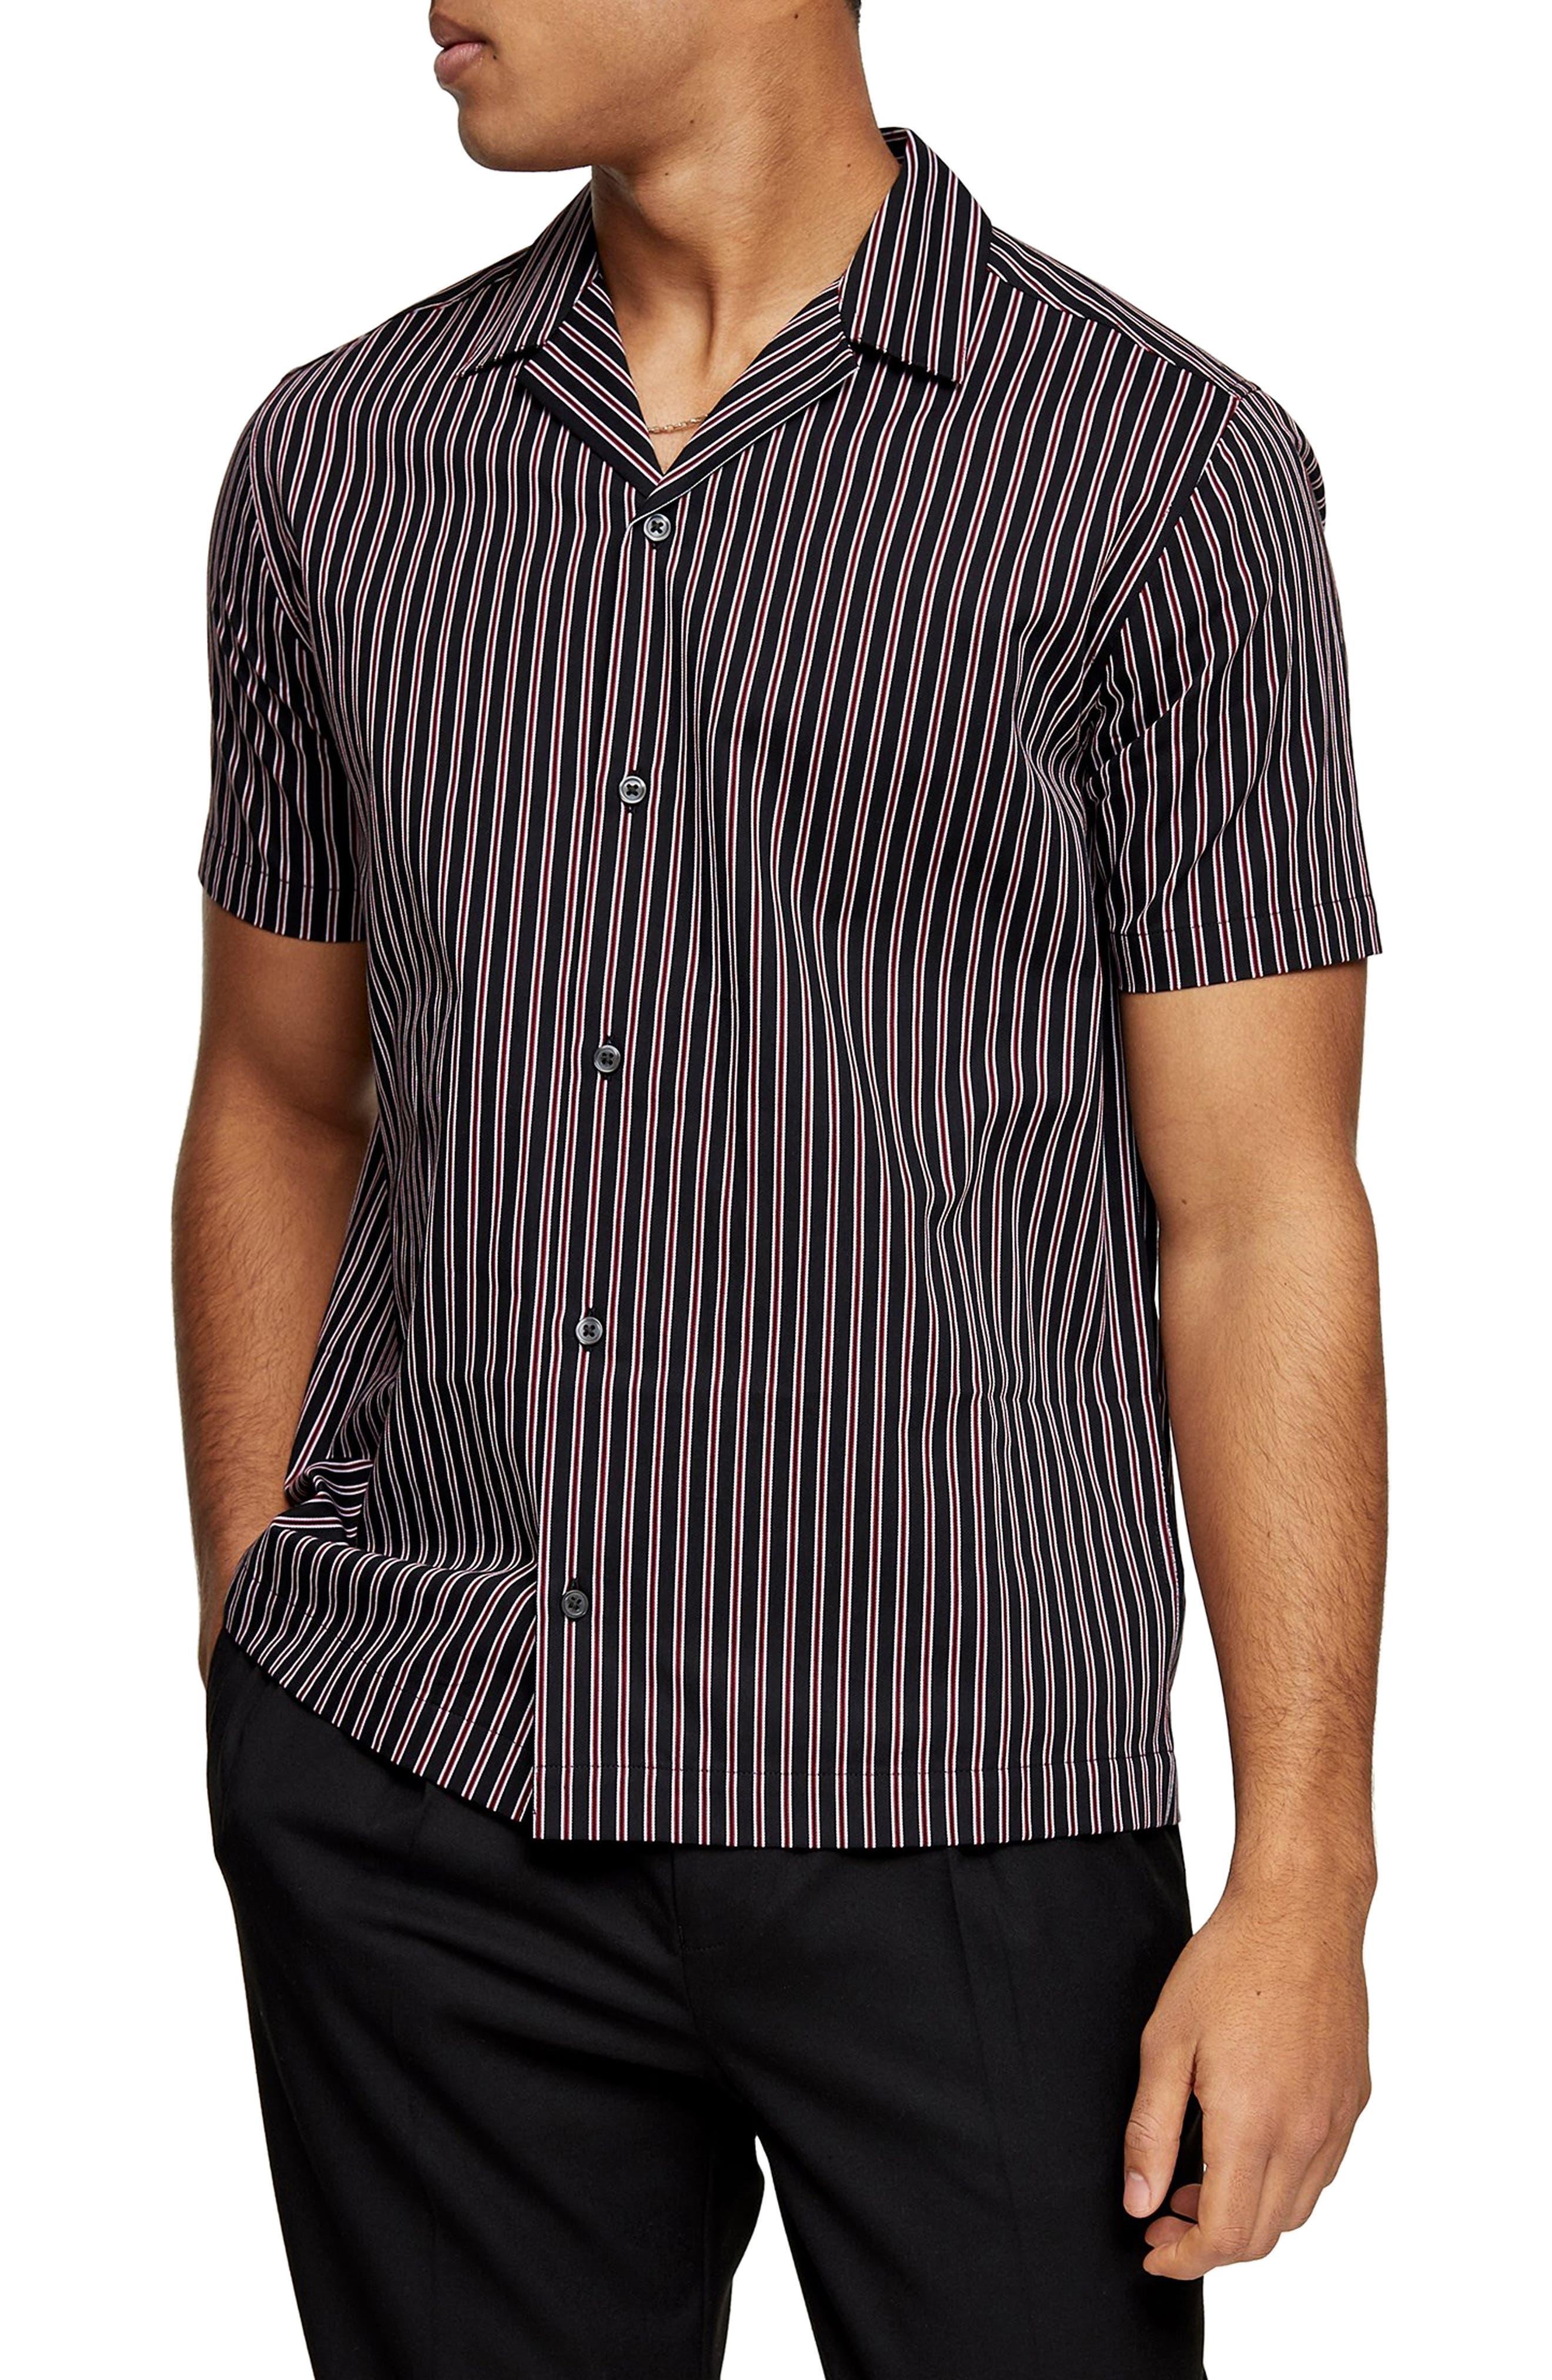 Mens Vintage Shirts – Retro Shirts Mens Topman Stripe Short Sleeve Button-Up Camp Shirt $27.00 AT vintagedancer.com